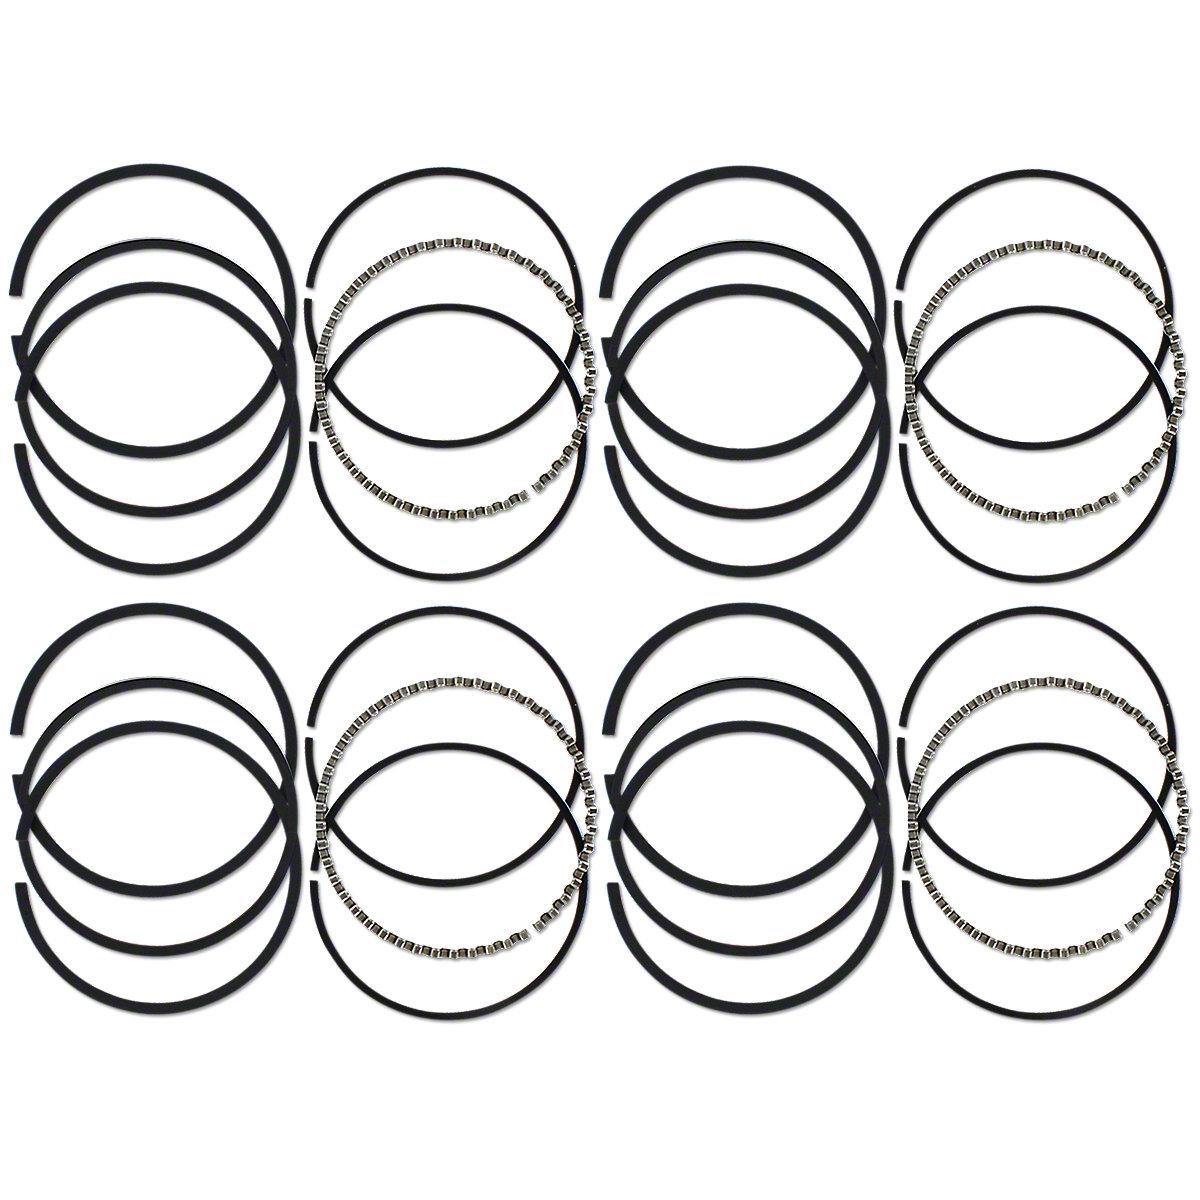 Mey Ferguson 135 Wiring Diagram Alternator Alternator